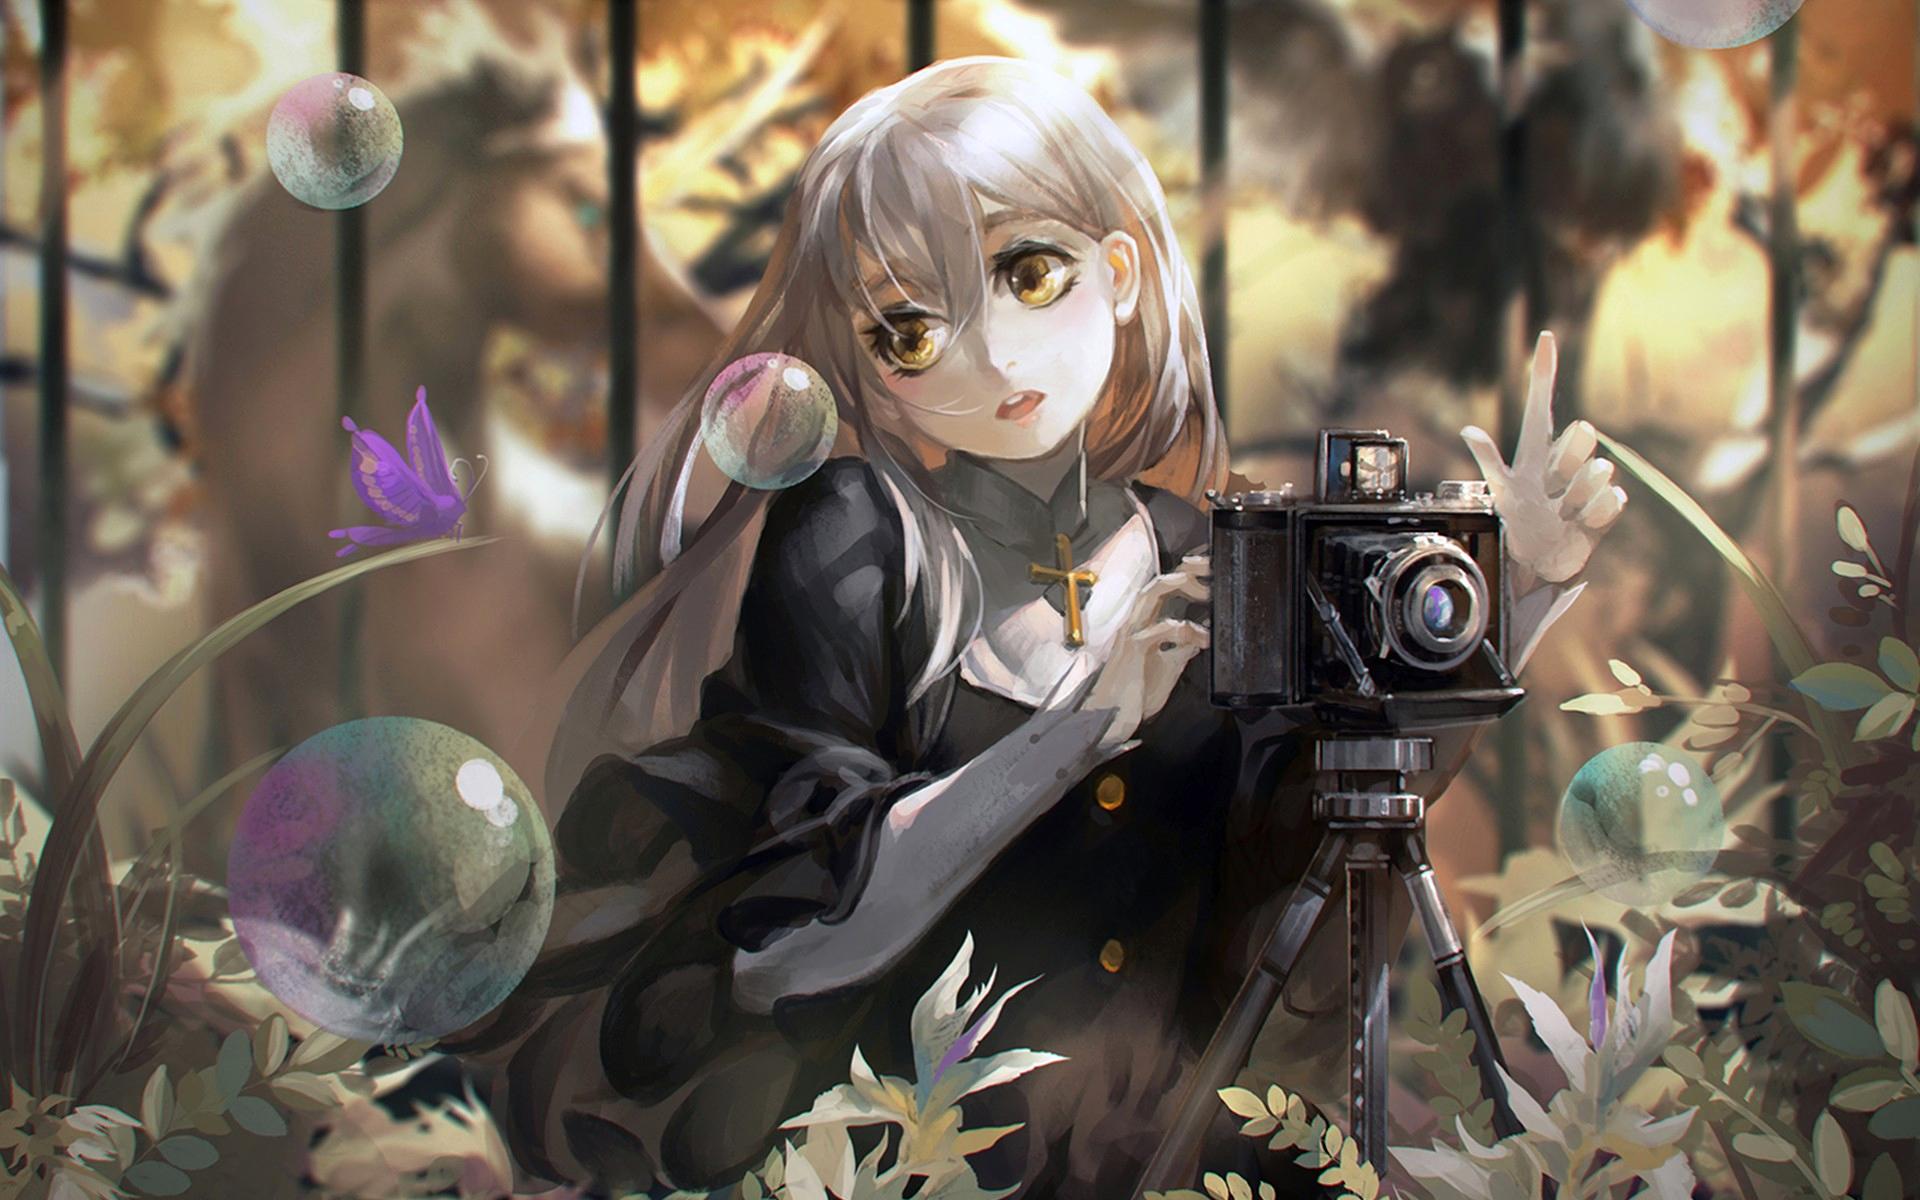 Аниме девушка фотограф